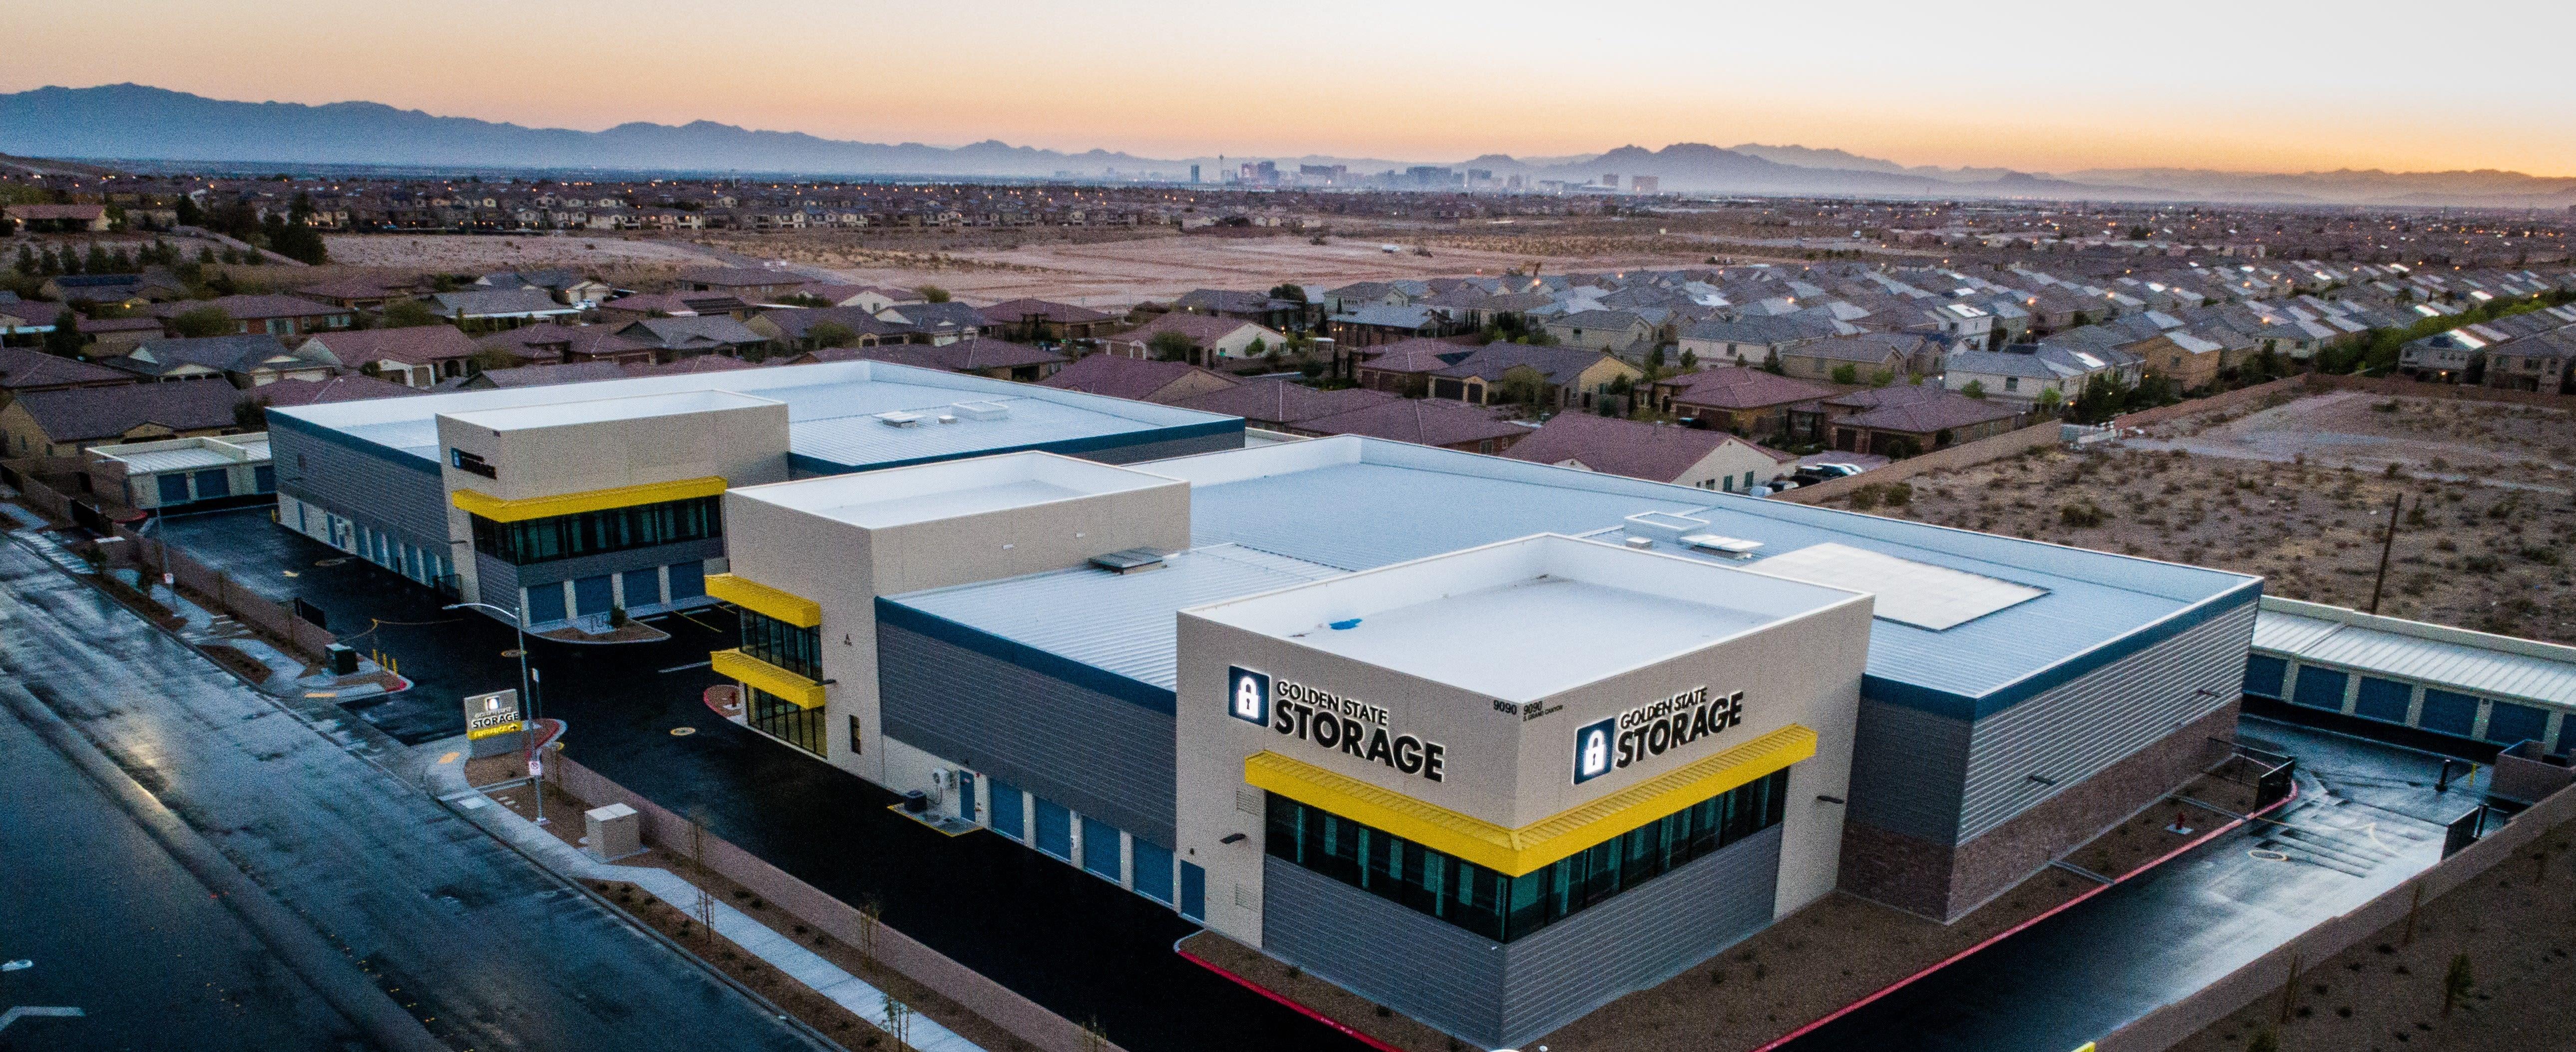 Self storage from Golden State Storage - Blue Diamond in Las Vegas, Nevada